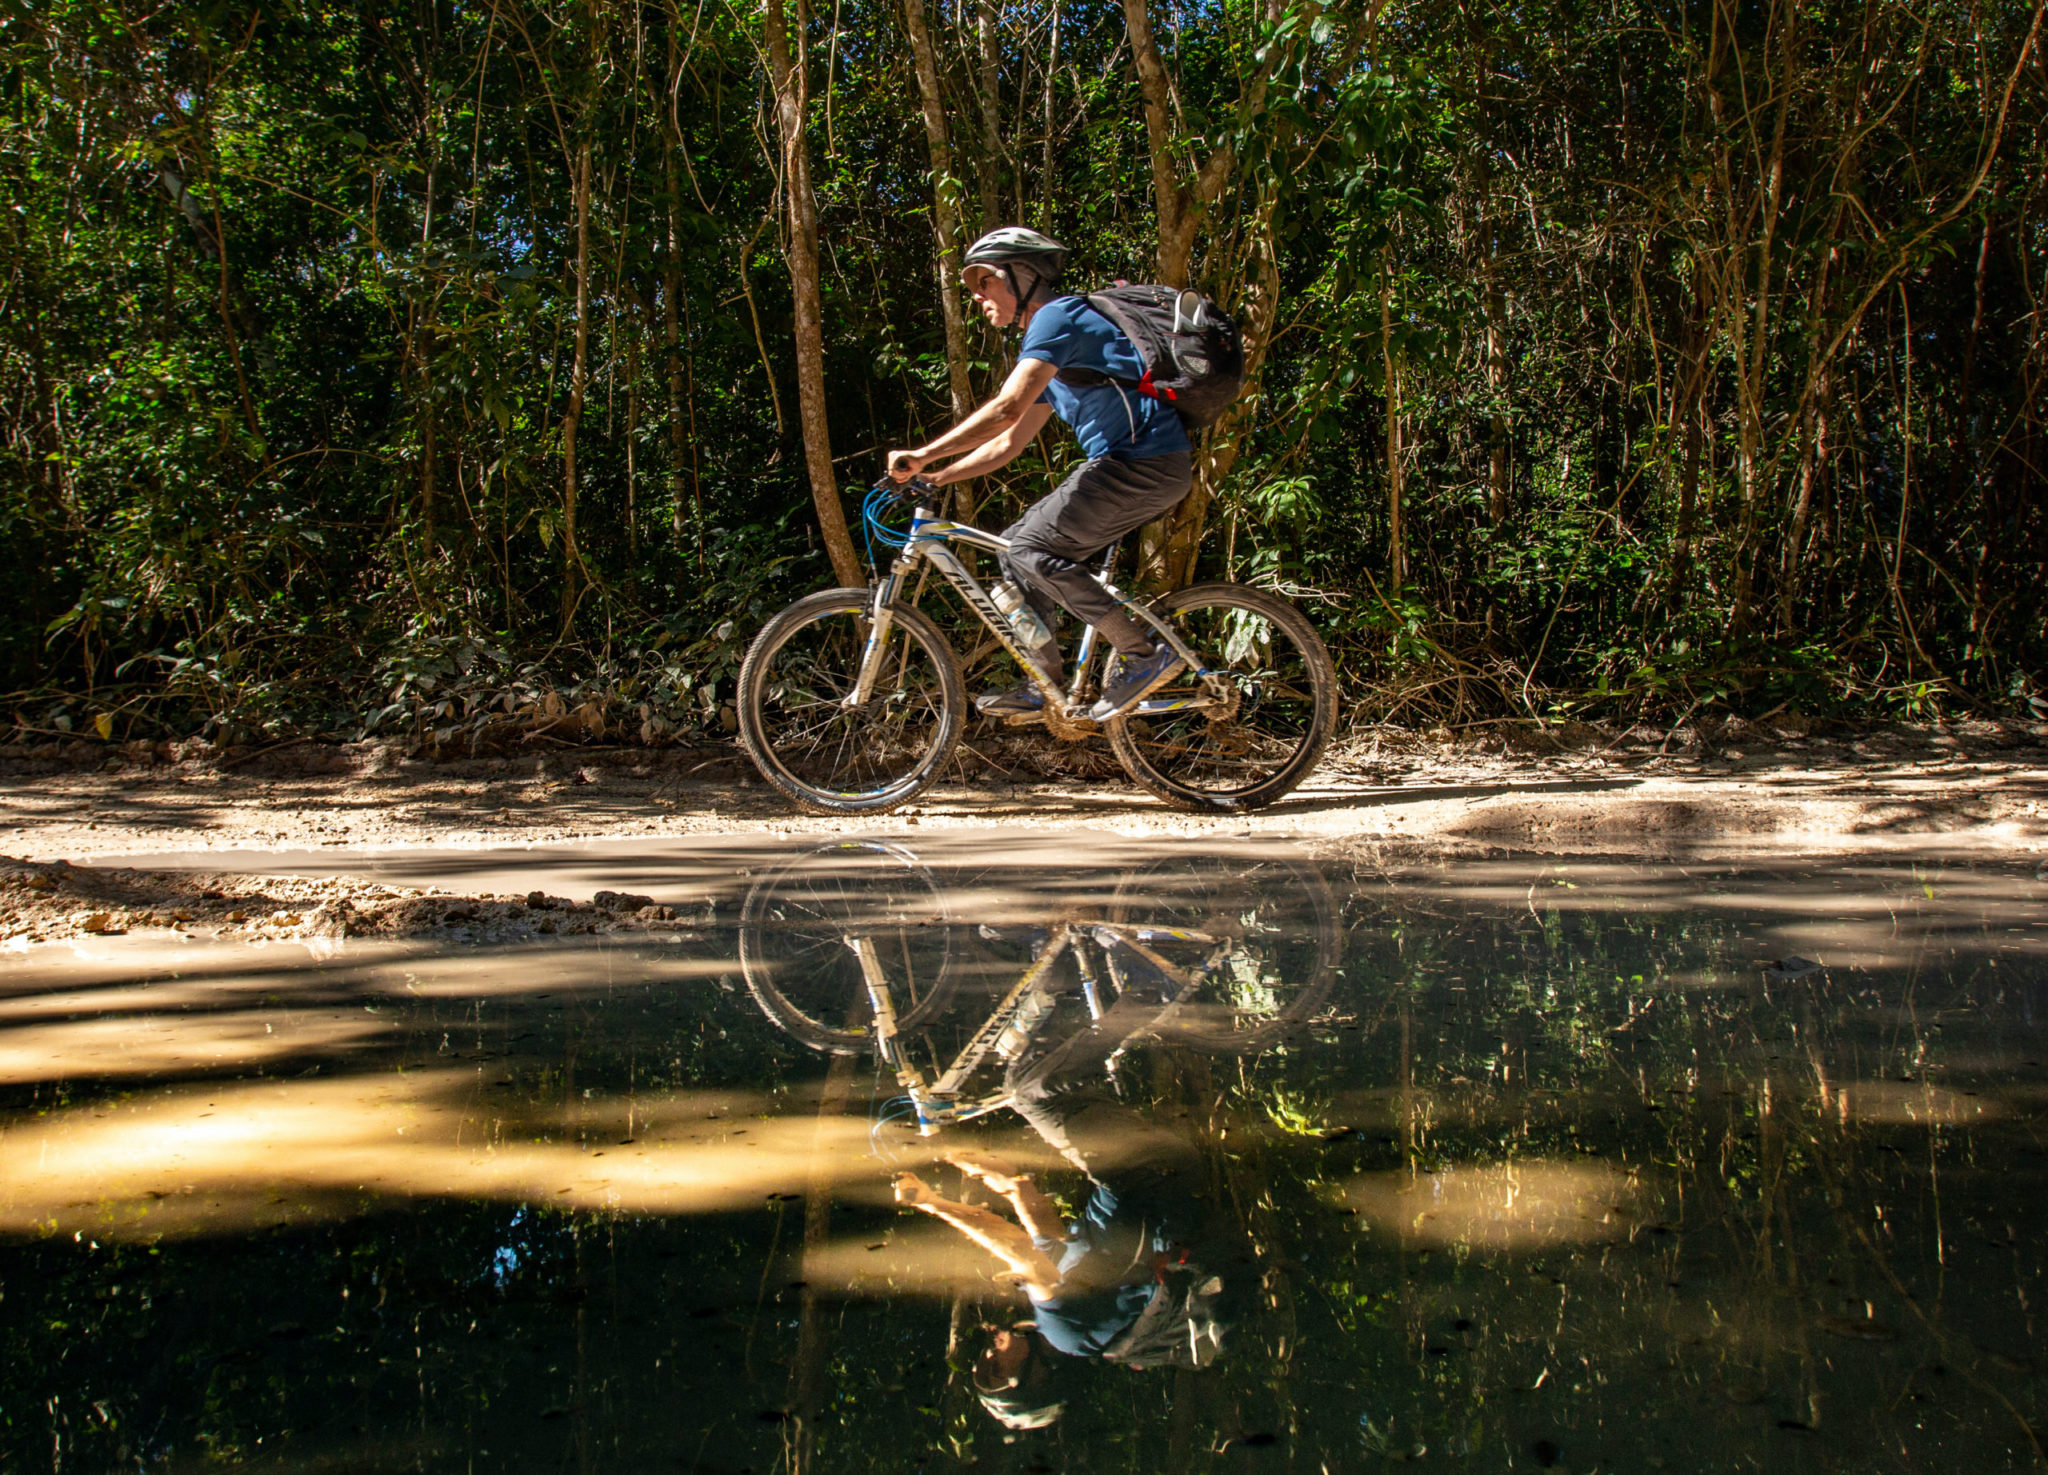 Cenote Trail Bike Tour – Mexico Adventure above & below the jungle